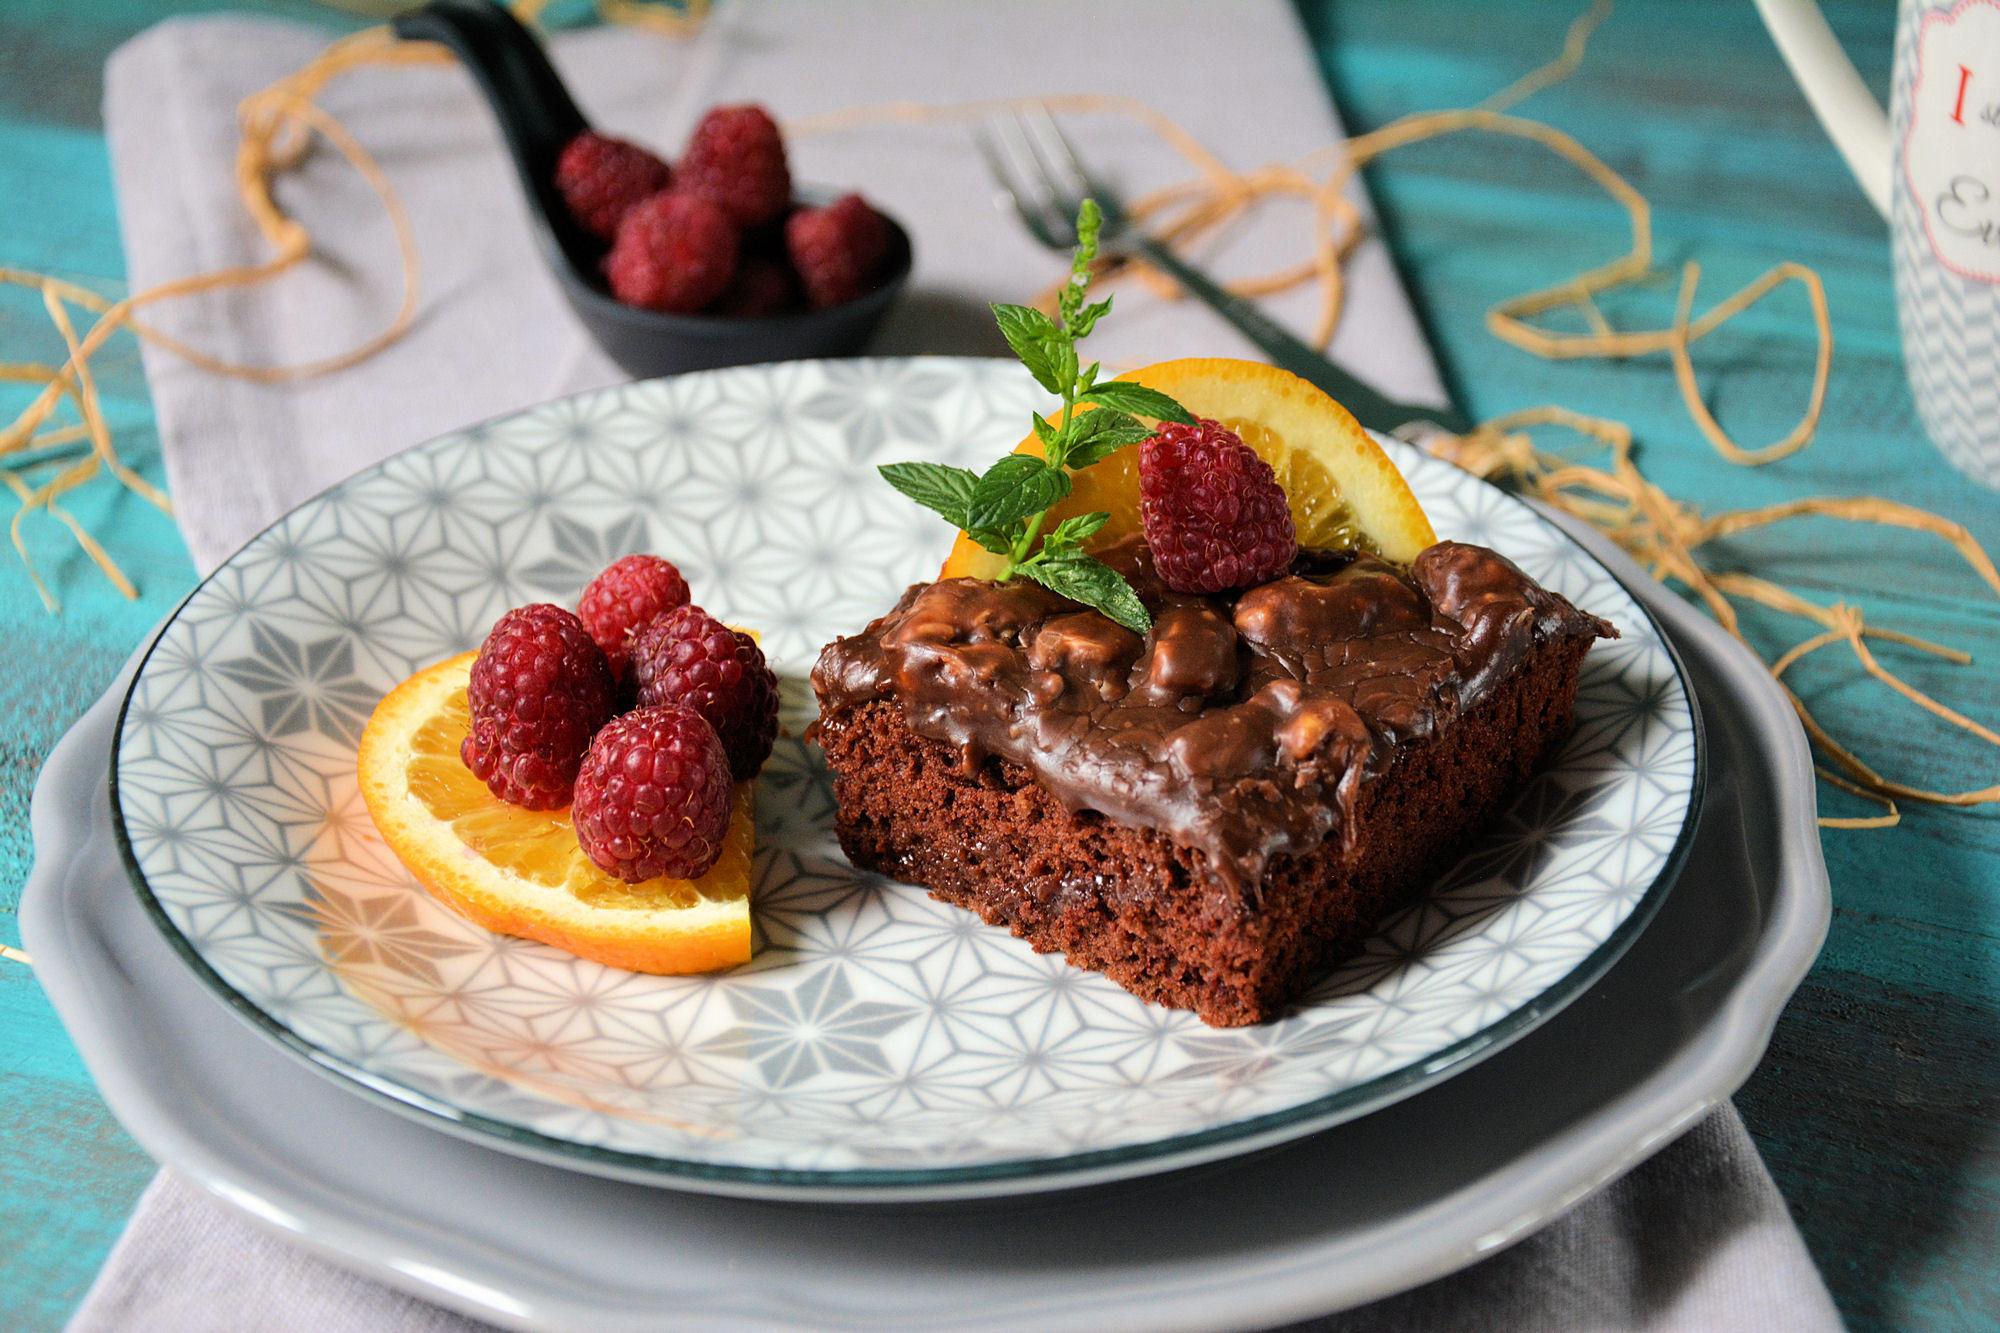 Čokoladni Nutela/Snikers kolač bez jaja, mleka, margarina & miksera (video)